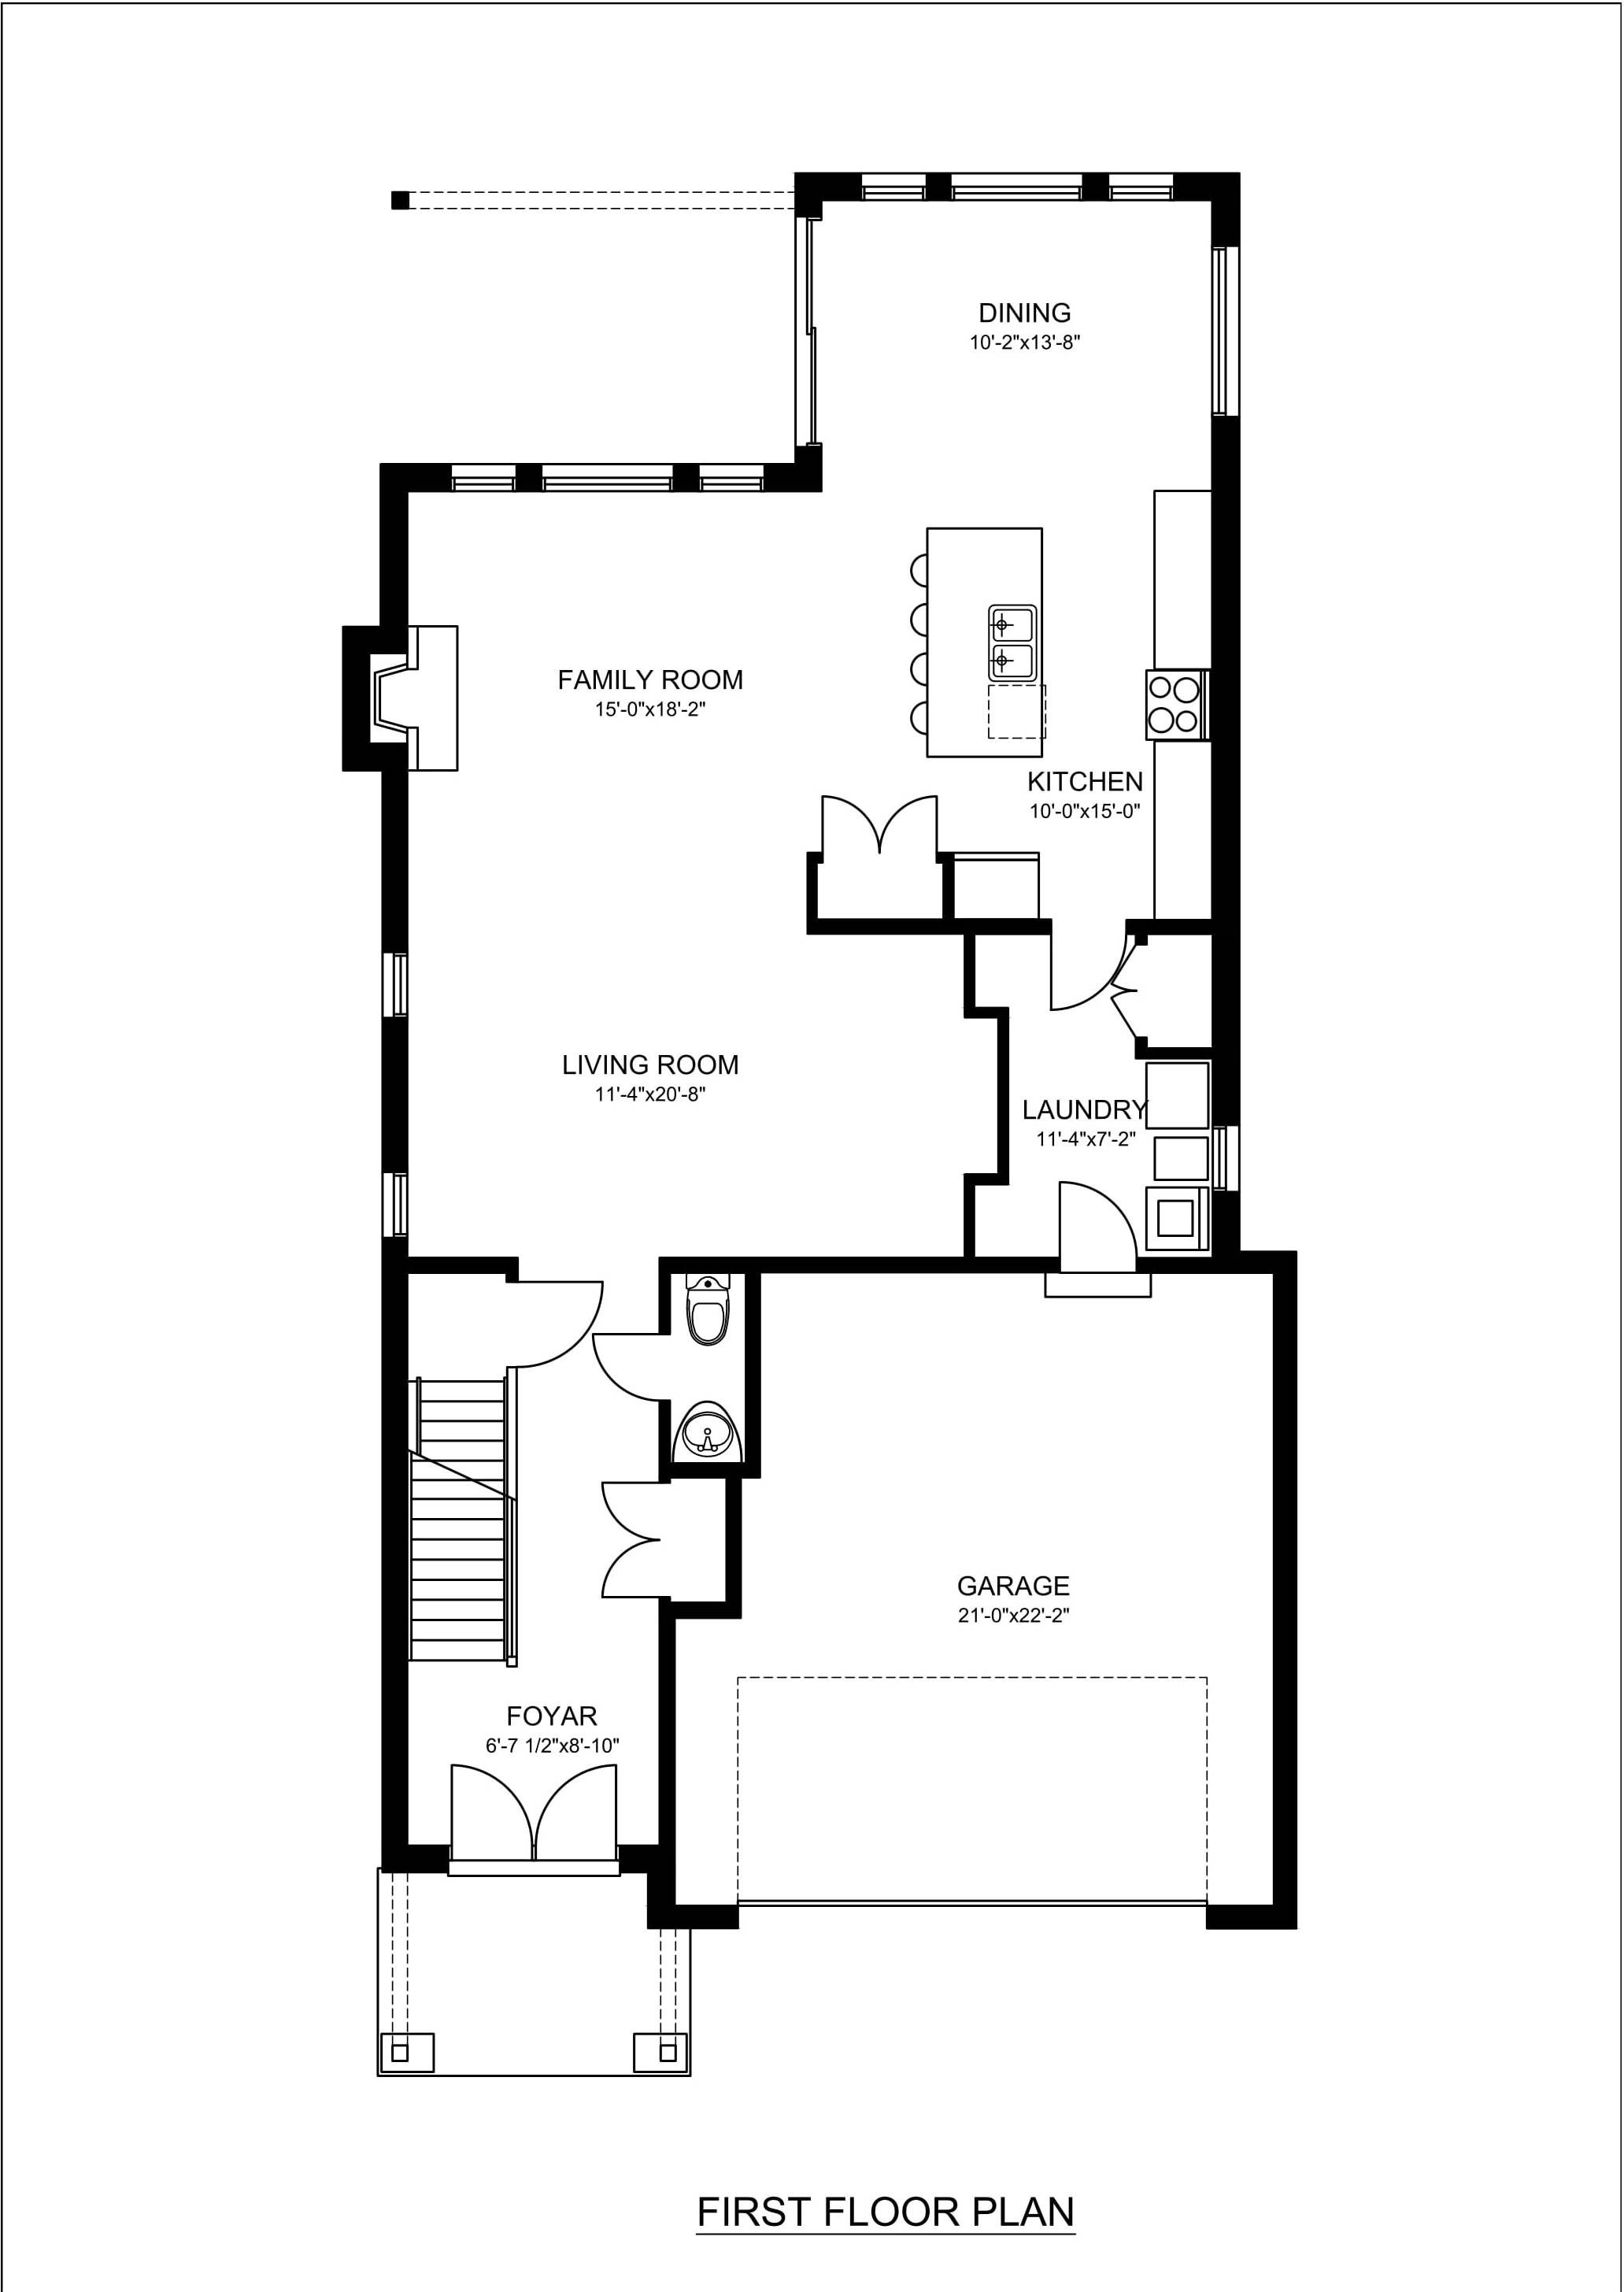 Shared Plan In 2020 Home Design Floor Plans Living Room Floor Plans Bedroom Layout Design